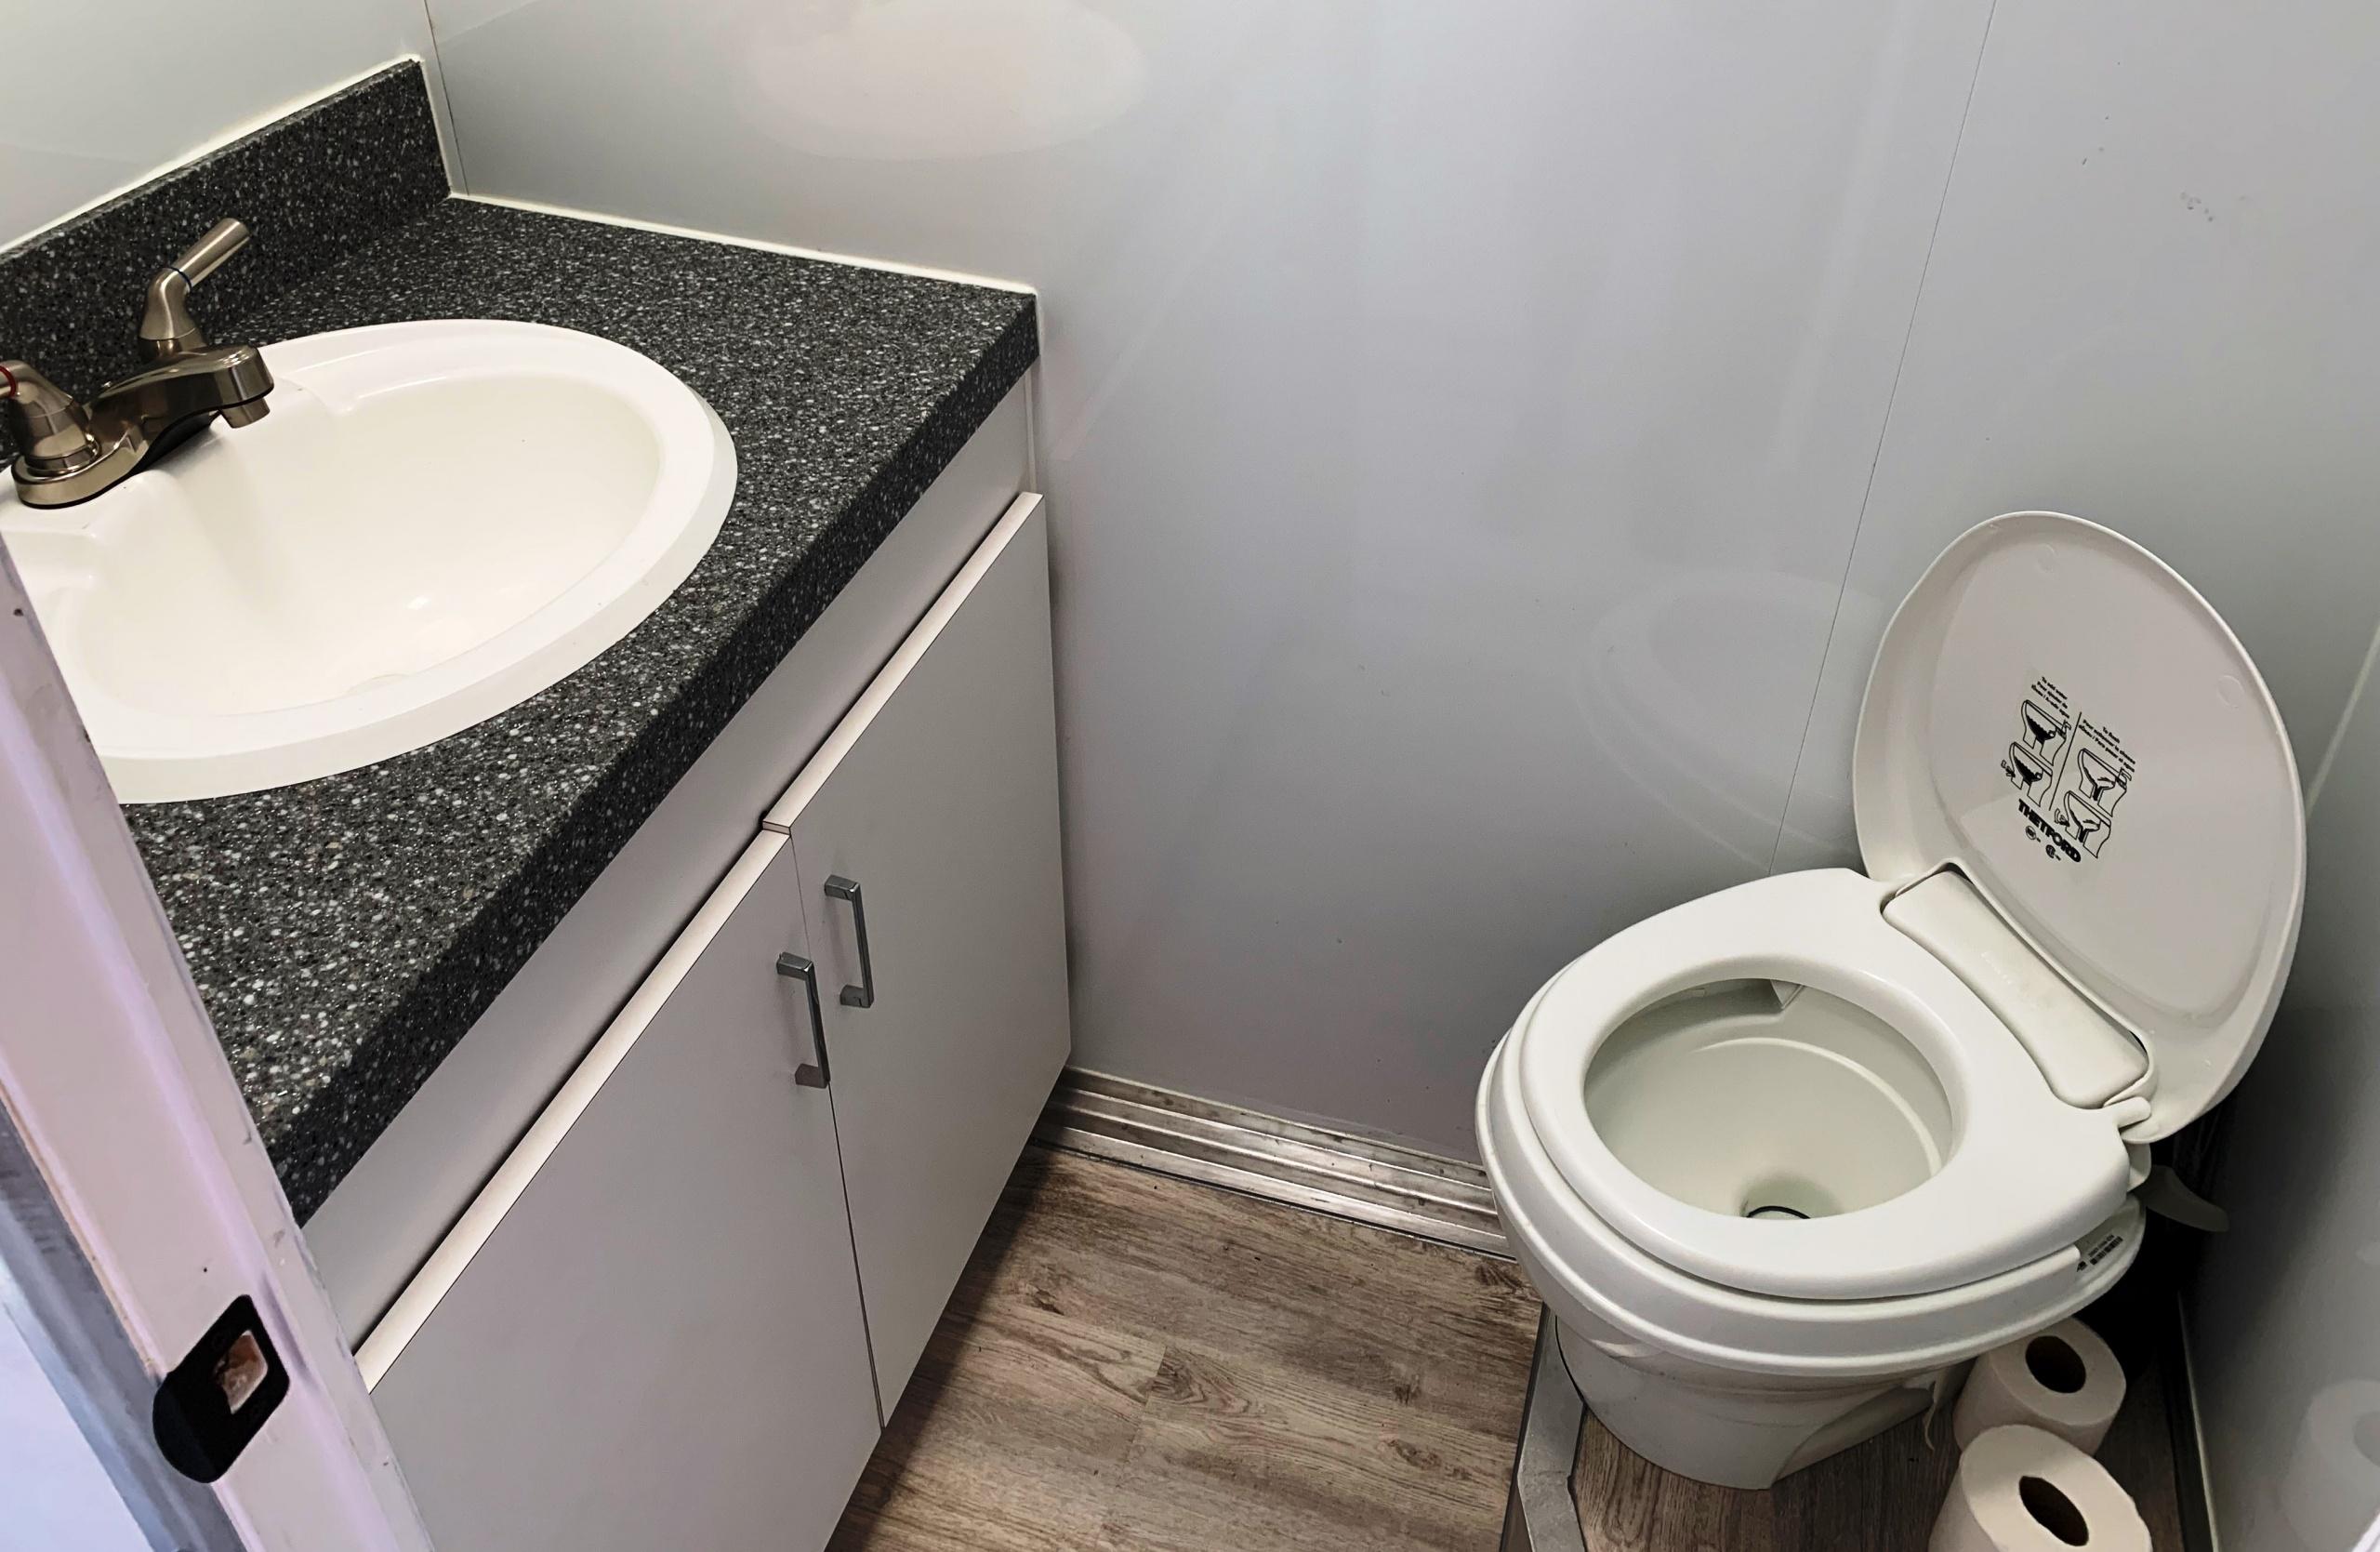 Advertising trailer bathroom